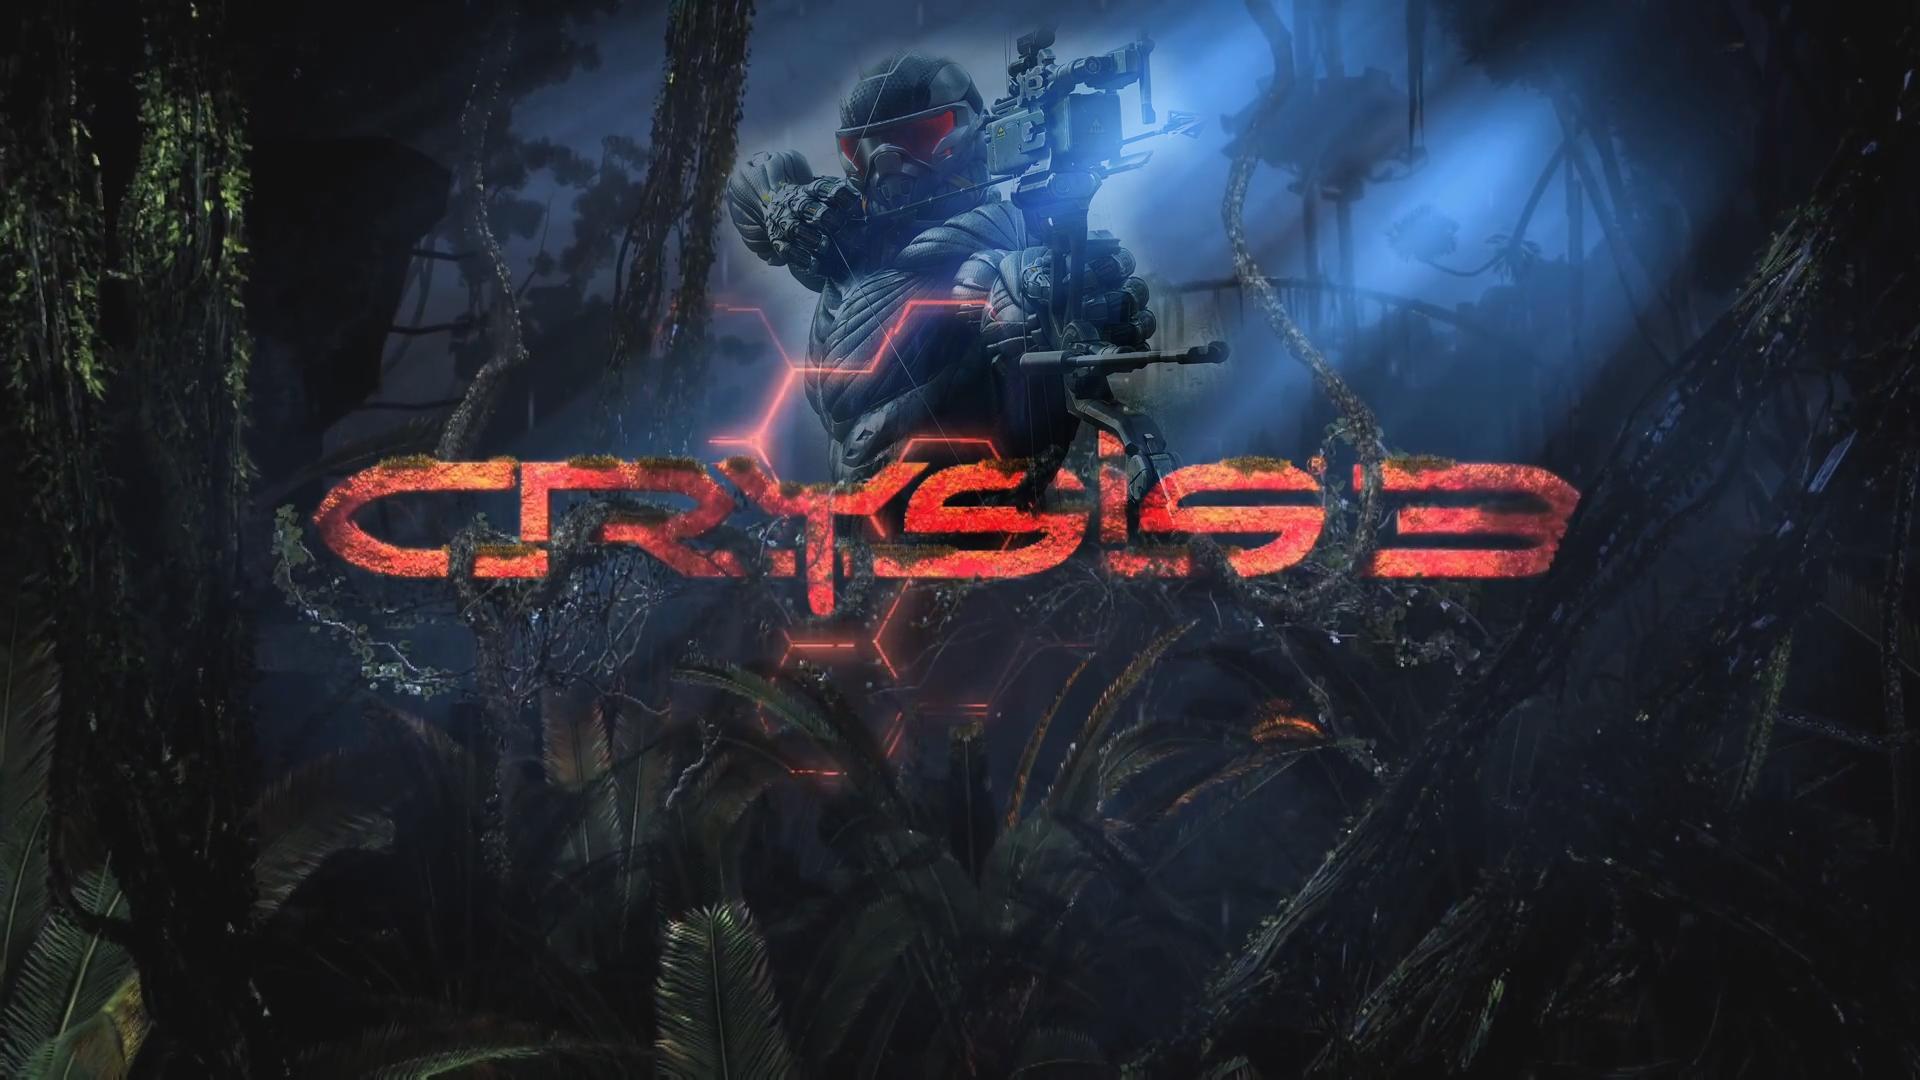 Crysis 3 Wallpapers - Wallpaper Cave